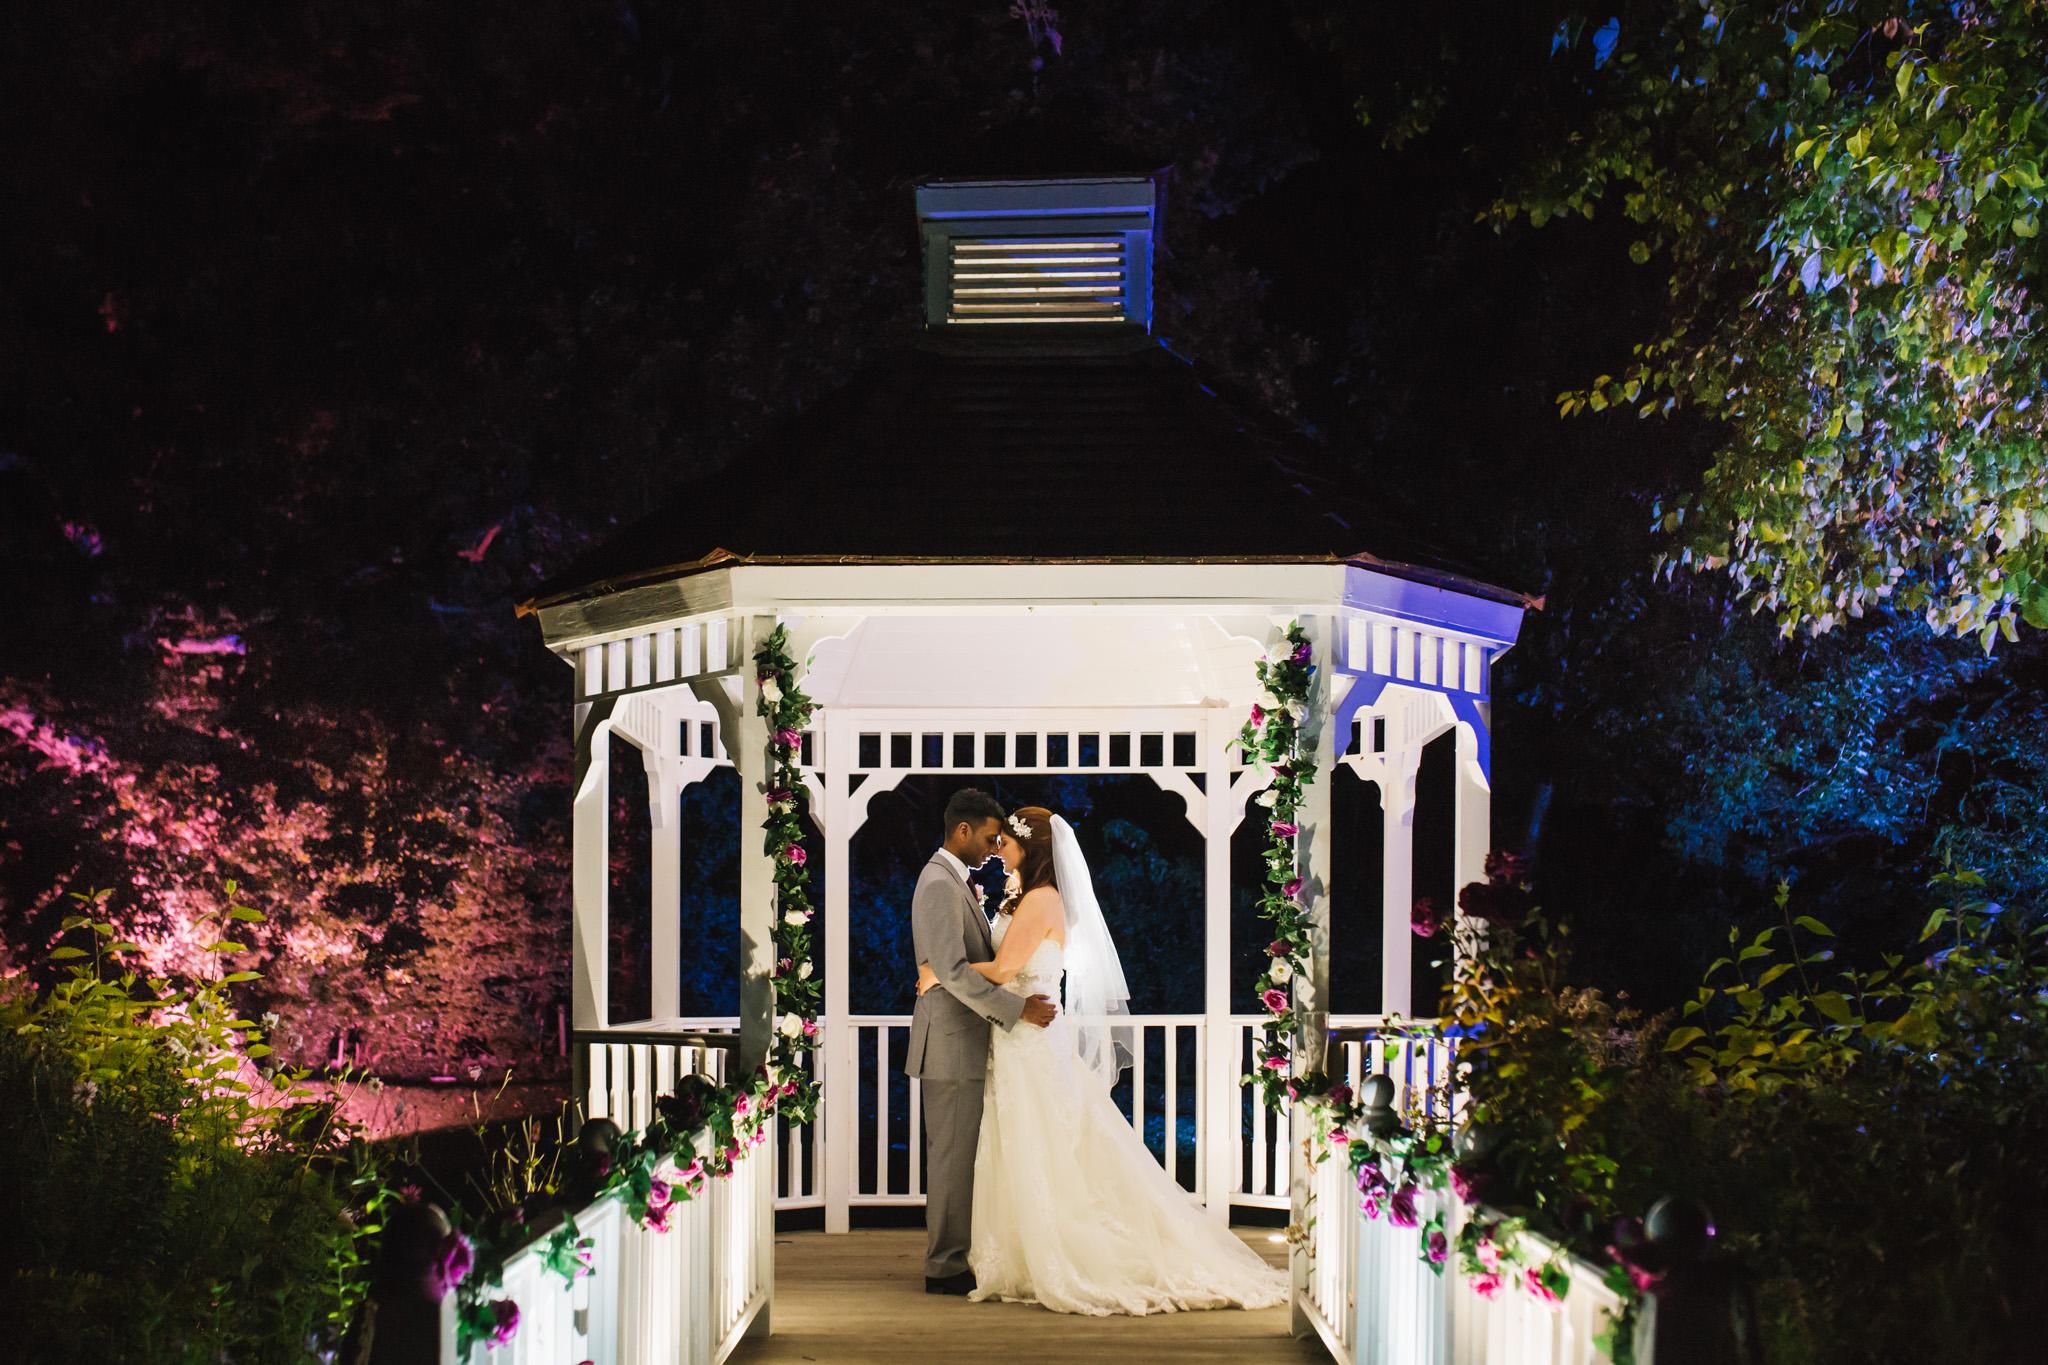 cat-lane-weddings__sheene-mill-wedding-photography__clw__2059__C5A0160.jpg